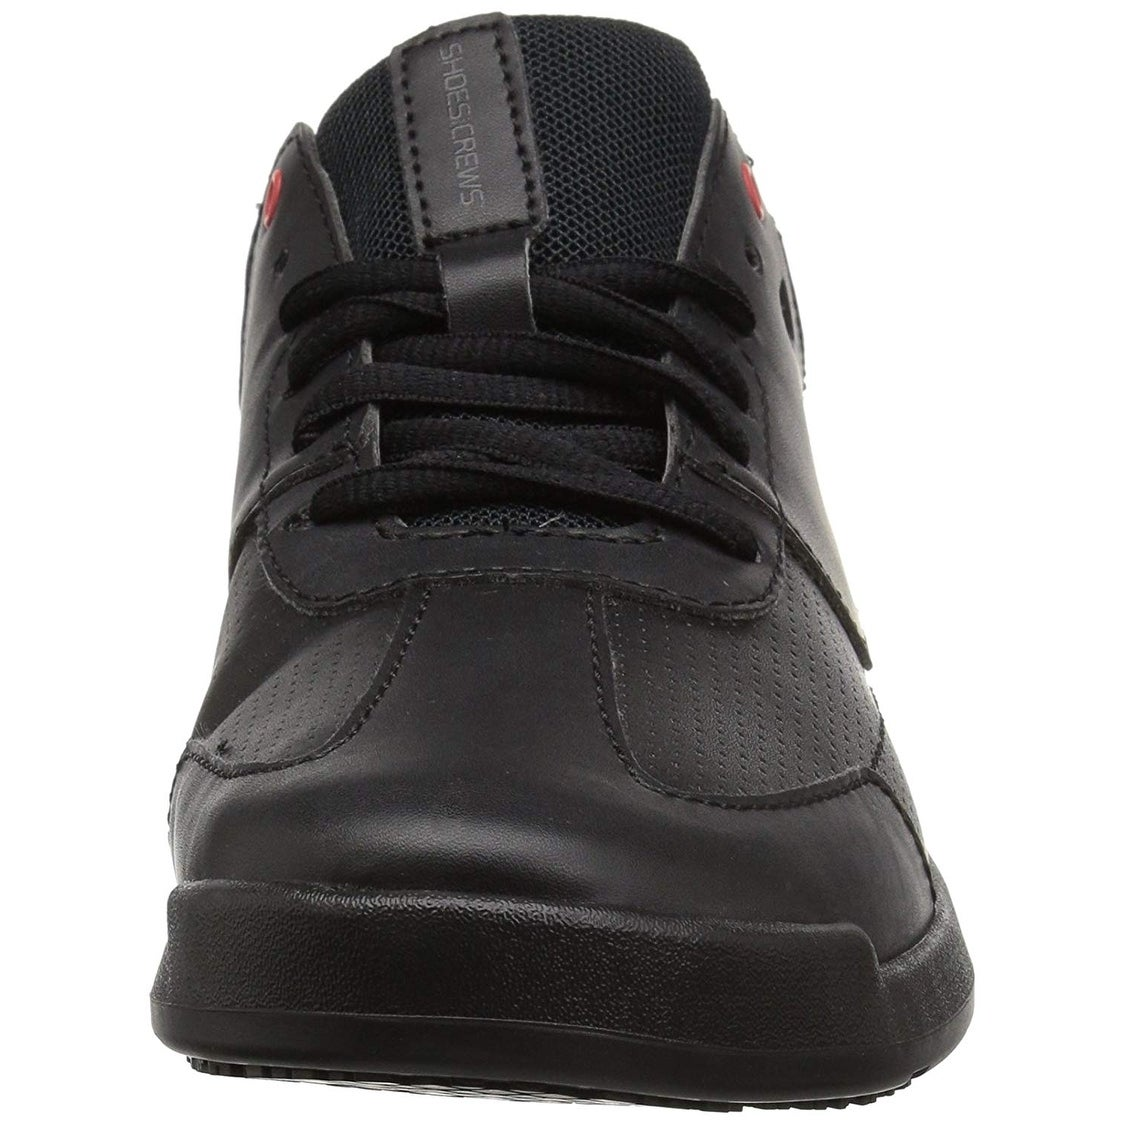 Shoes For Crews Women's Liberty Slip Resistant Food Service Work Sneaker 3 Medium US